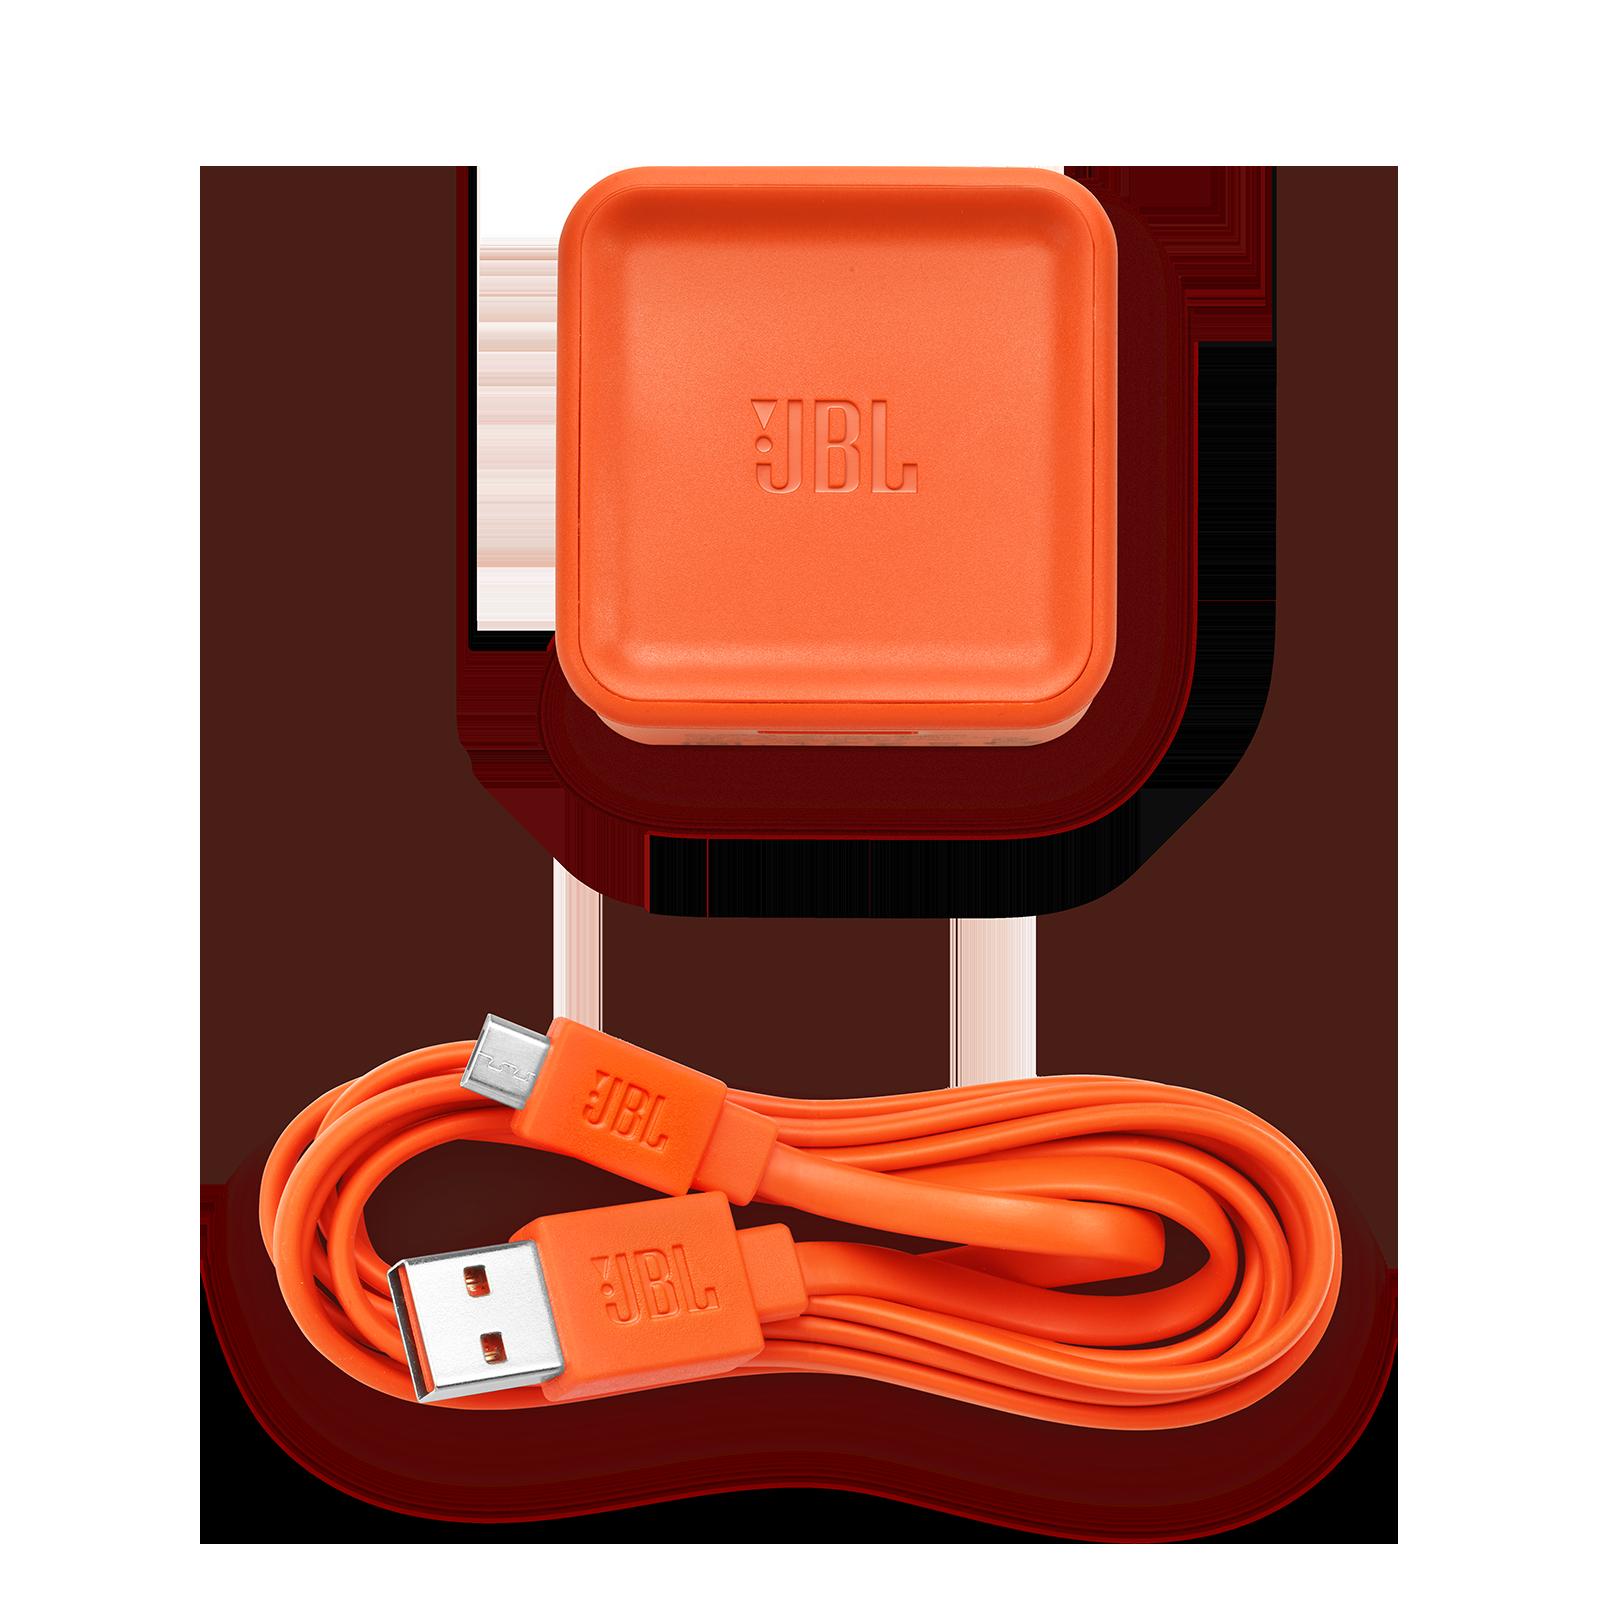 JBL Tuner - White - Portable Bluetooth Speaker with DAB/FM radio - Detailshot 2